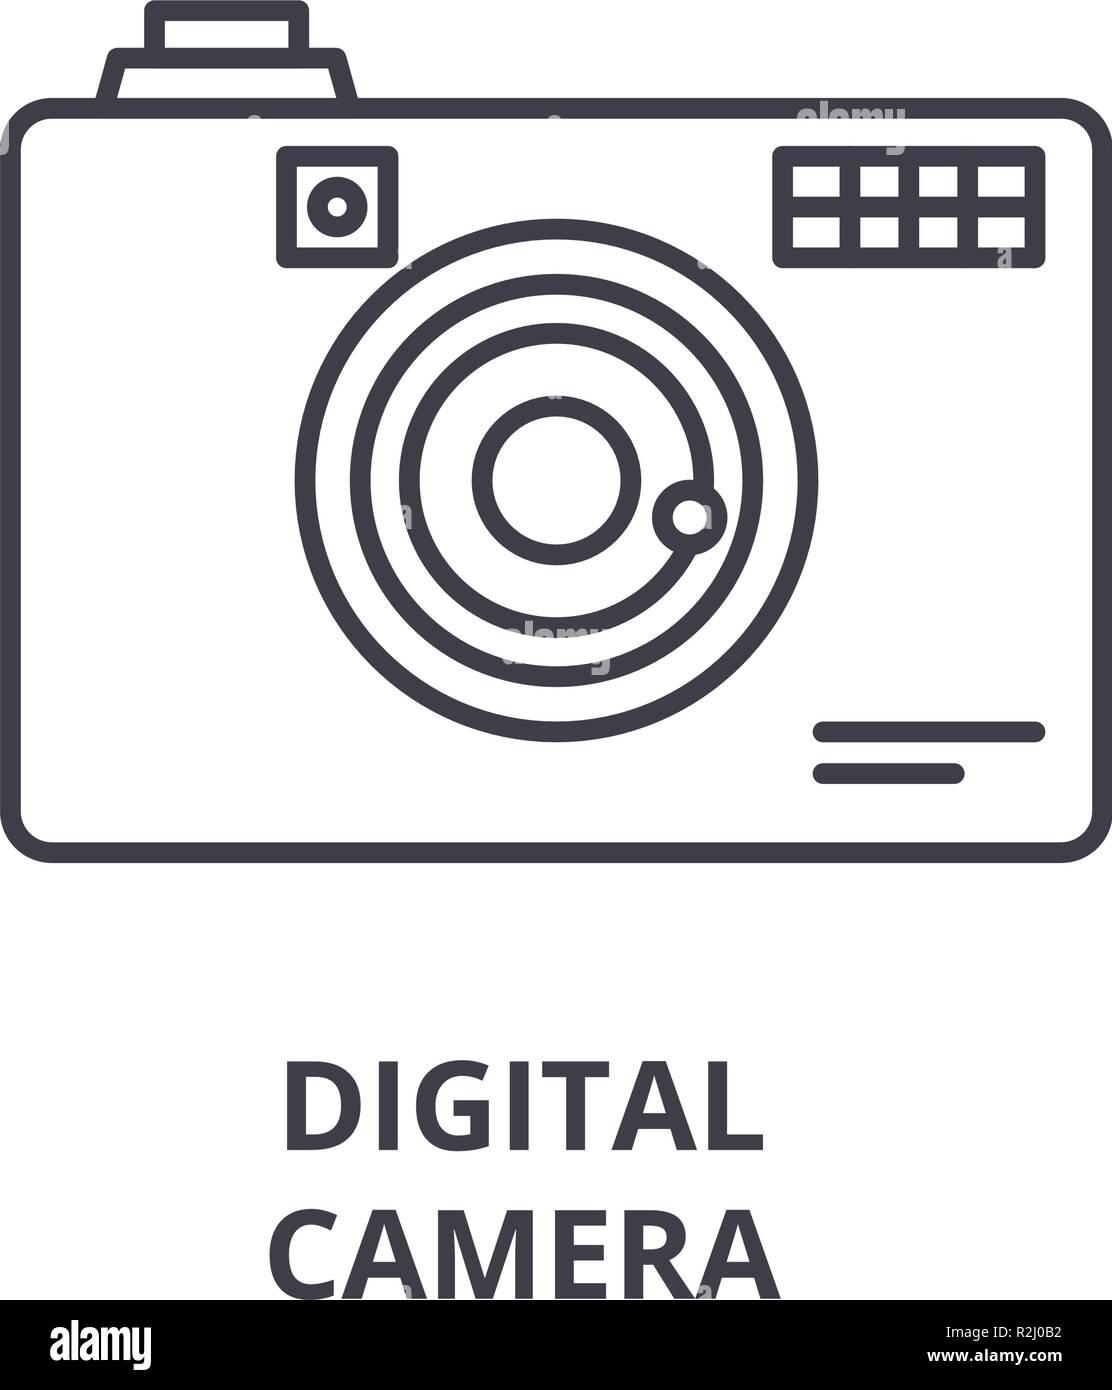 Digital camera line icon concept. Digital camera vector linear illustration, symbol, sign - Stock Image